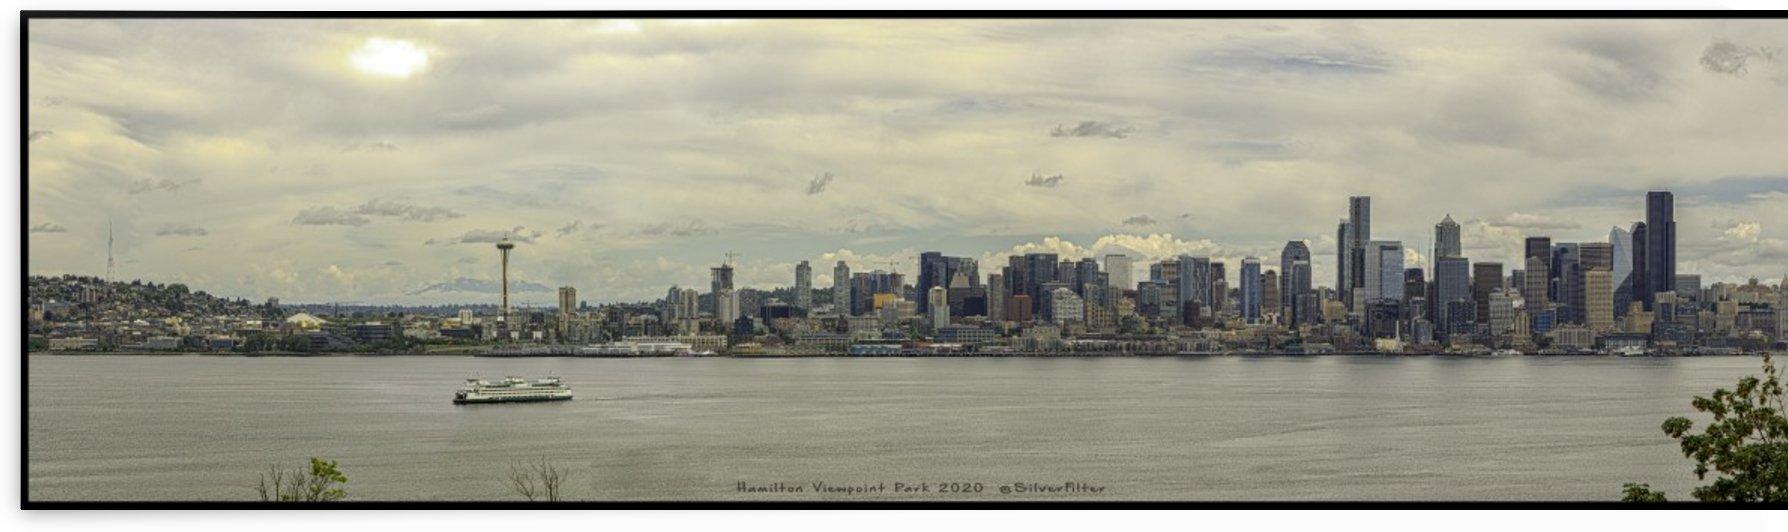 Hamilton Viewpoint Pano by Steve